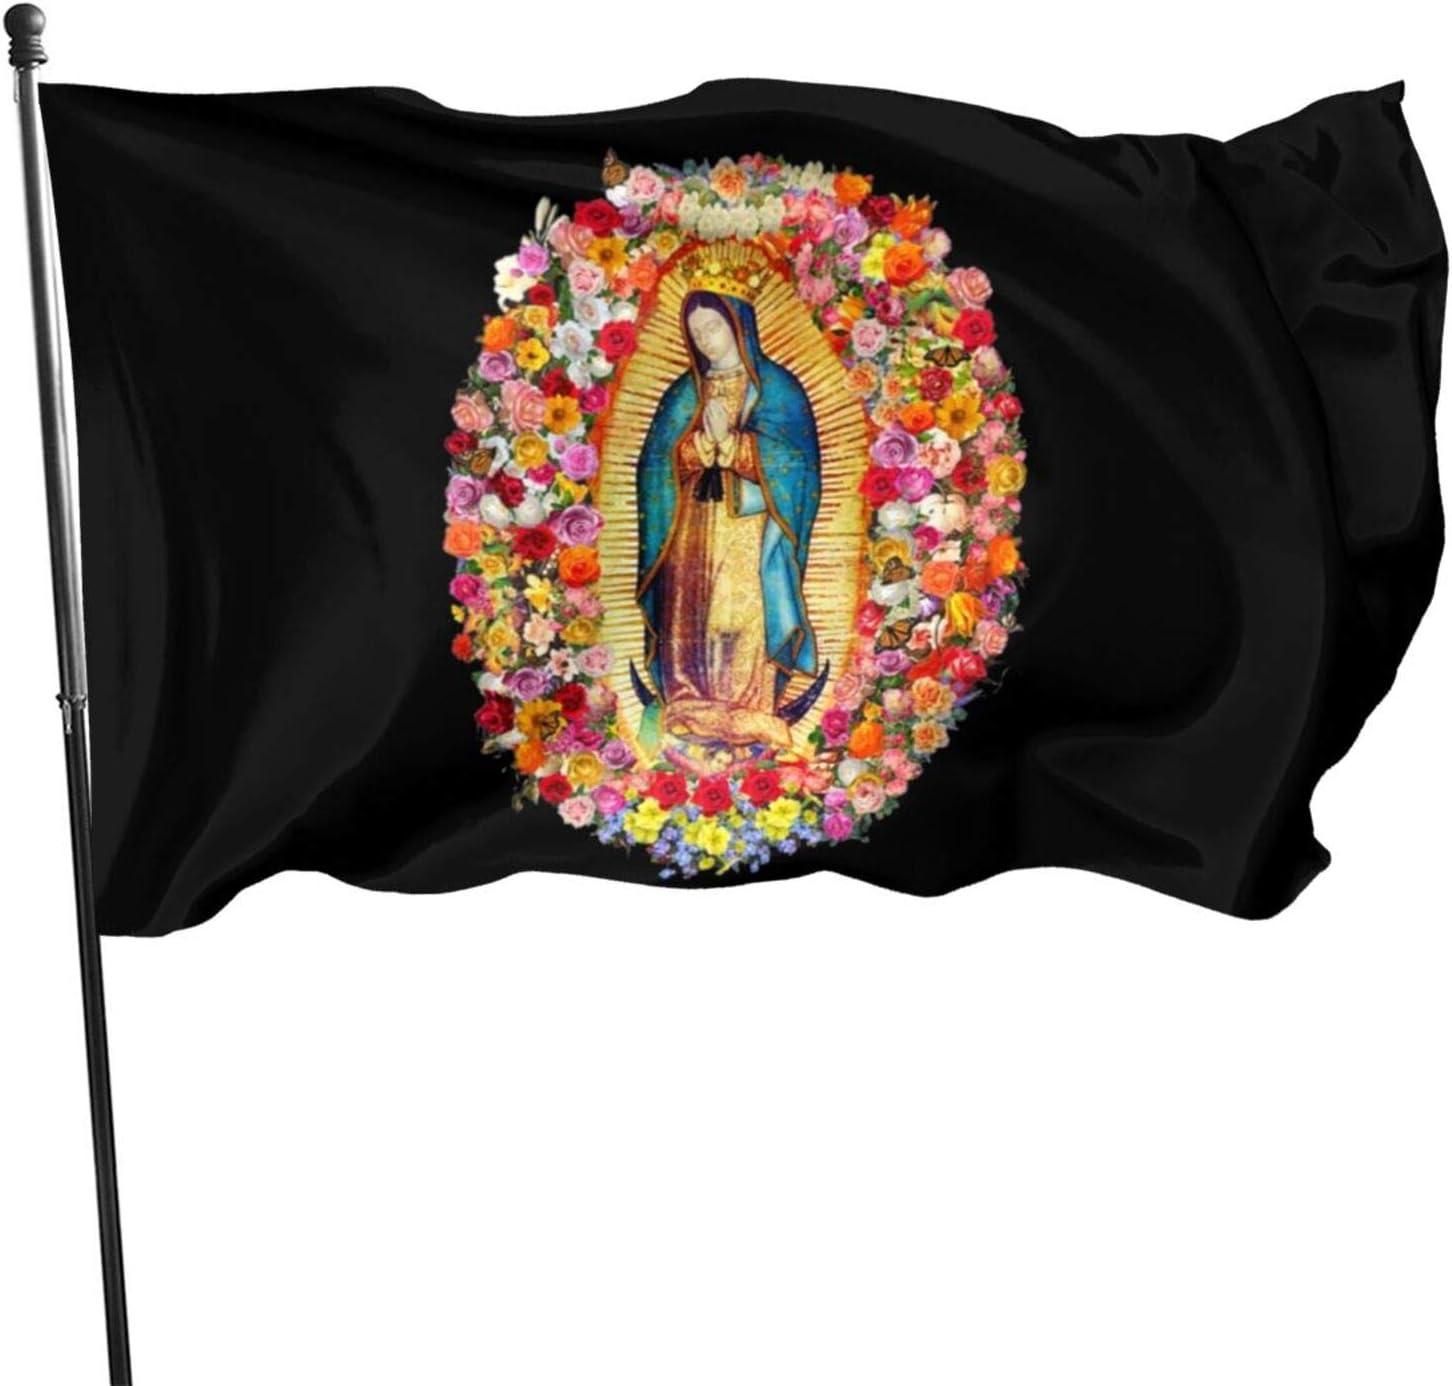 Voglawear Custom Garden Flag with Our Lady of Sorrows Catholic 3x5ft Outdoor Decorative Garden Banner Black